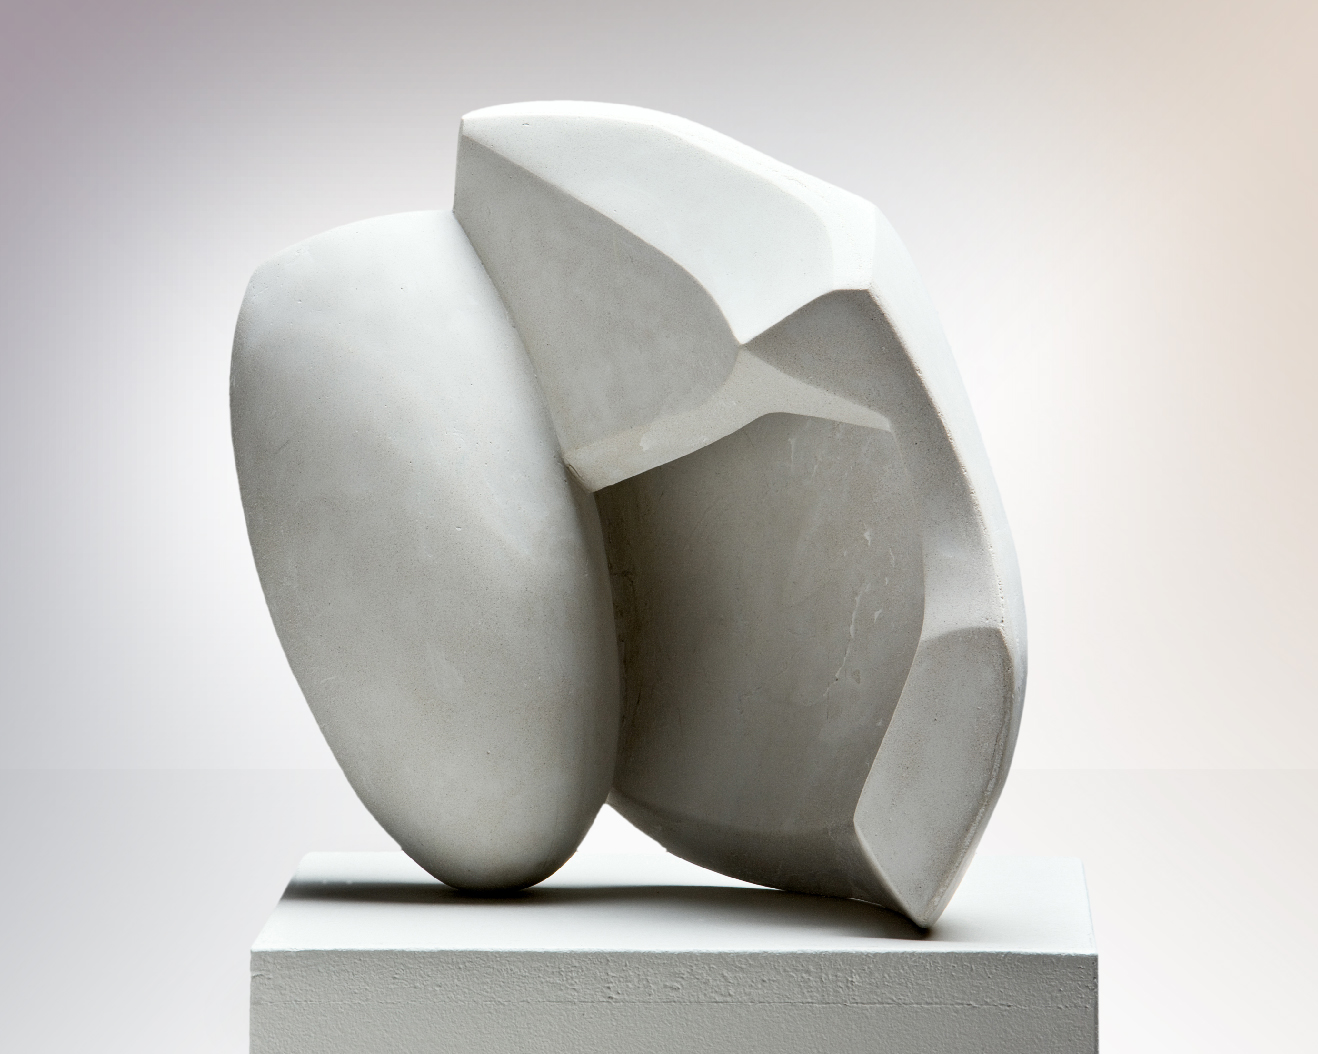 Sculpture-Carola-Eggeling-SavannahBay-focus